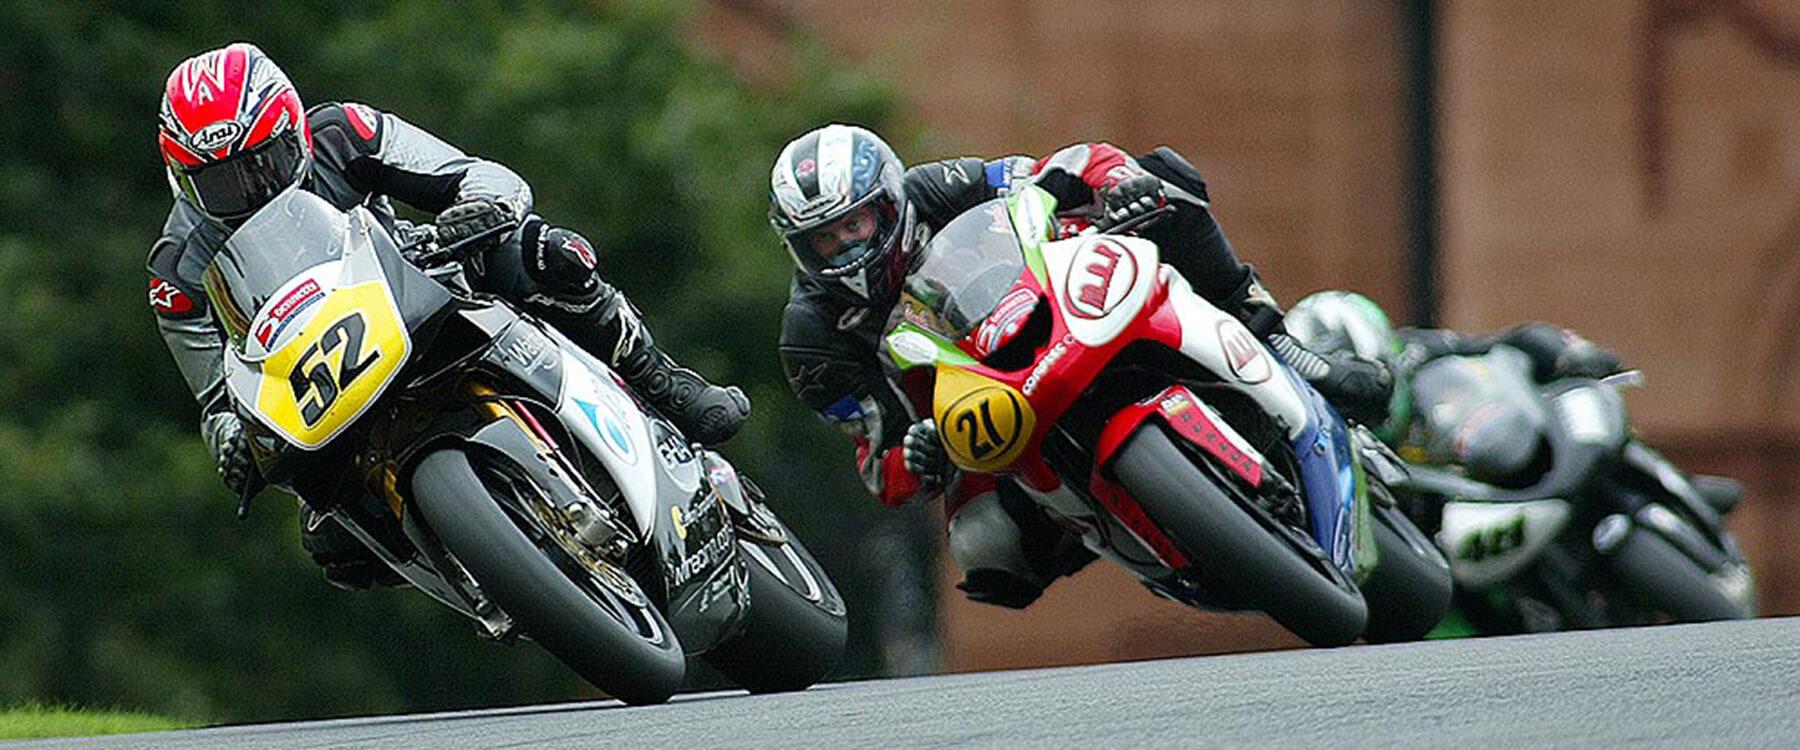 racing ducati 05